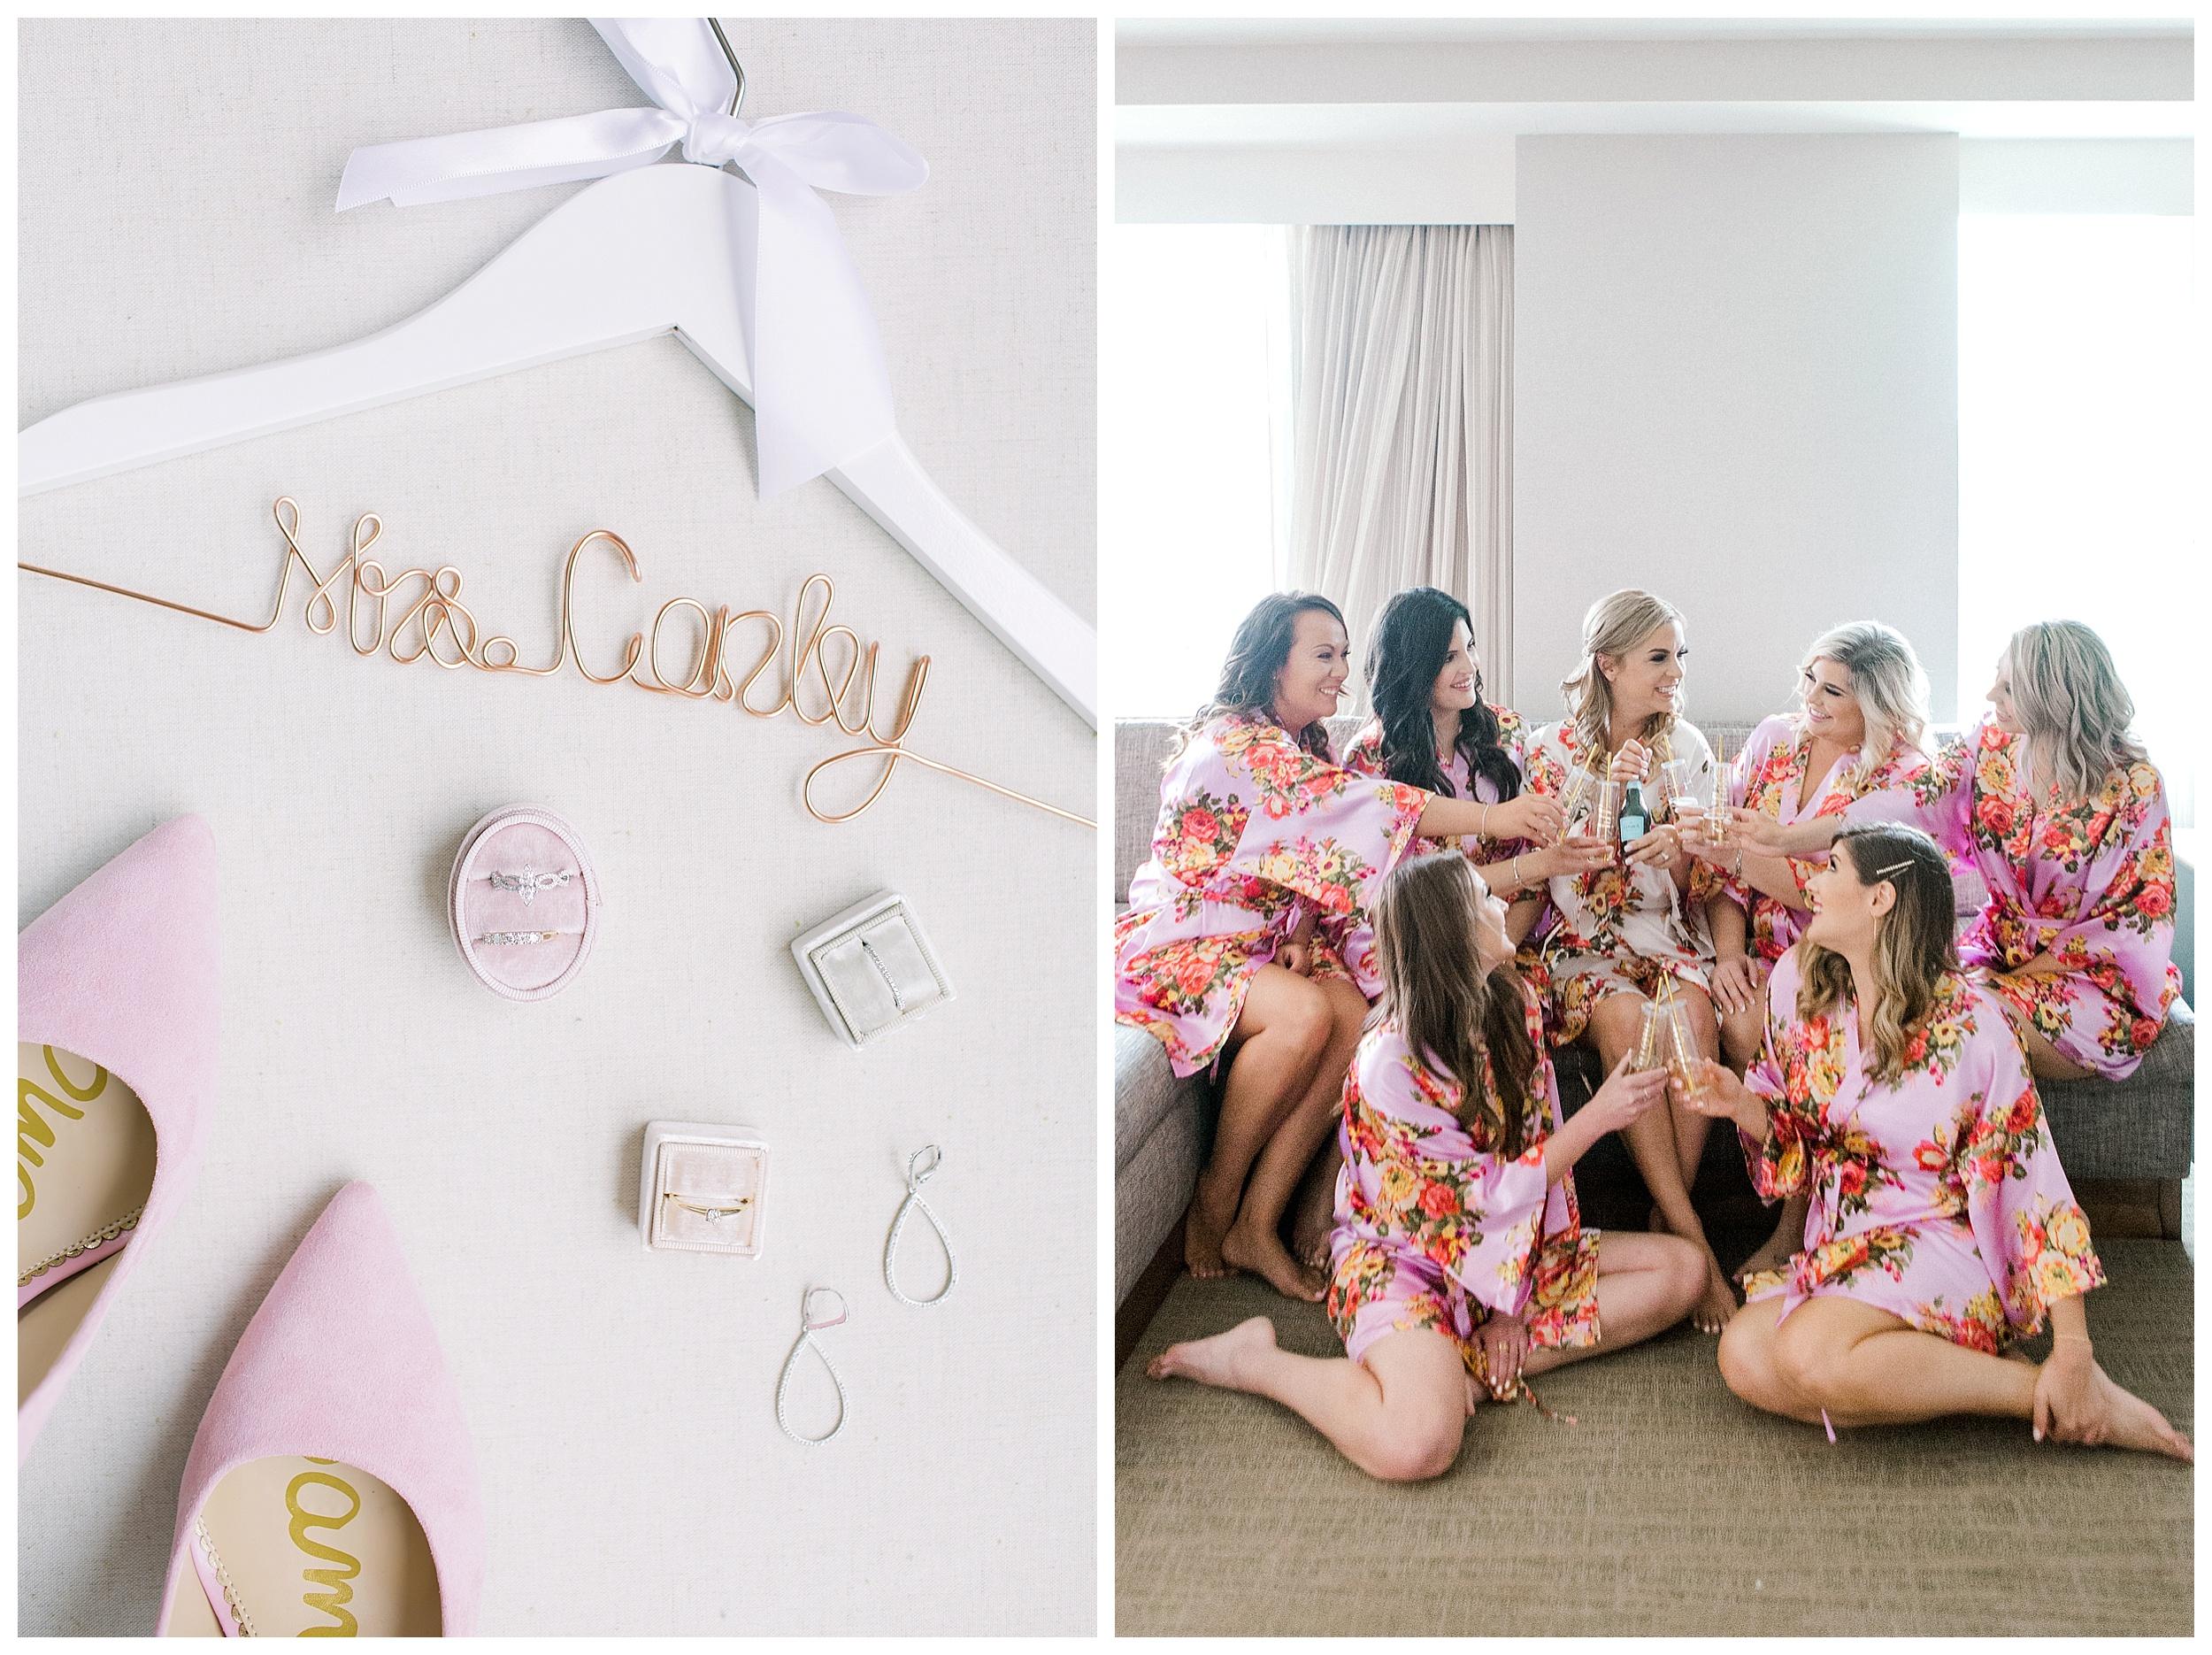 Lansdowne Resort Wedding | Virginia Film Wedding Photographer Kir Tuben_0002.jpg